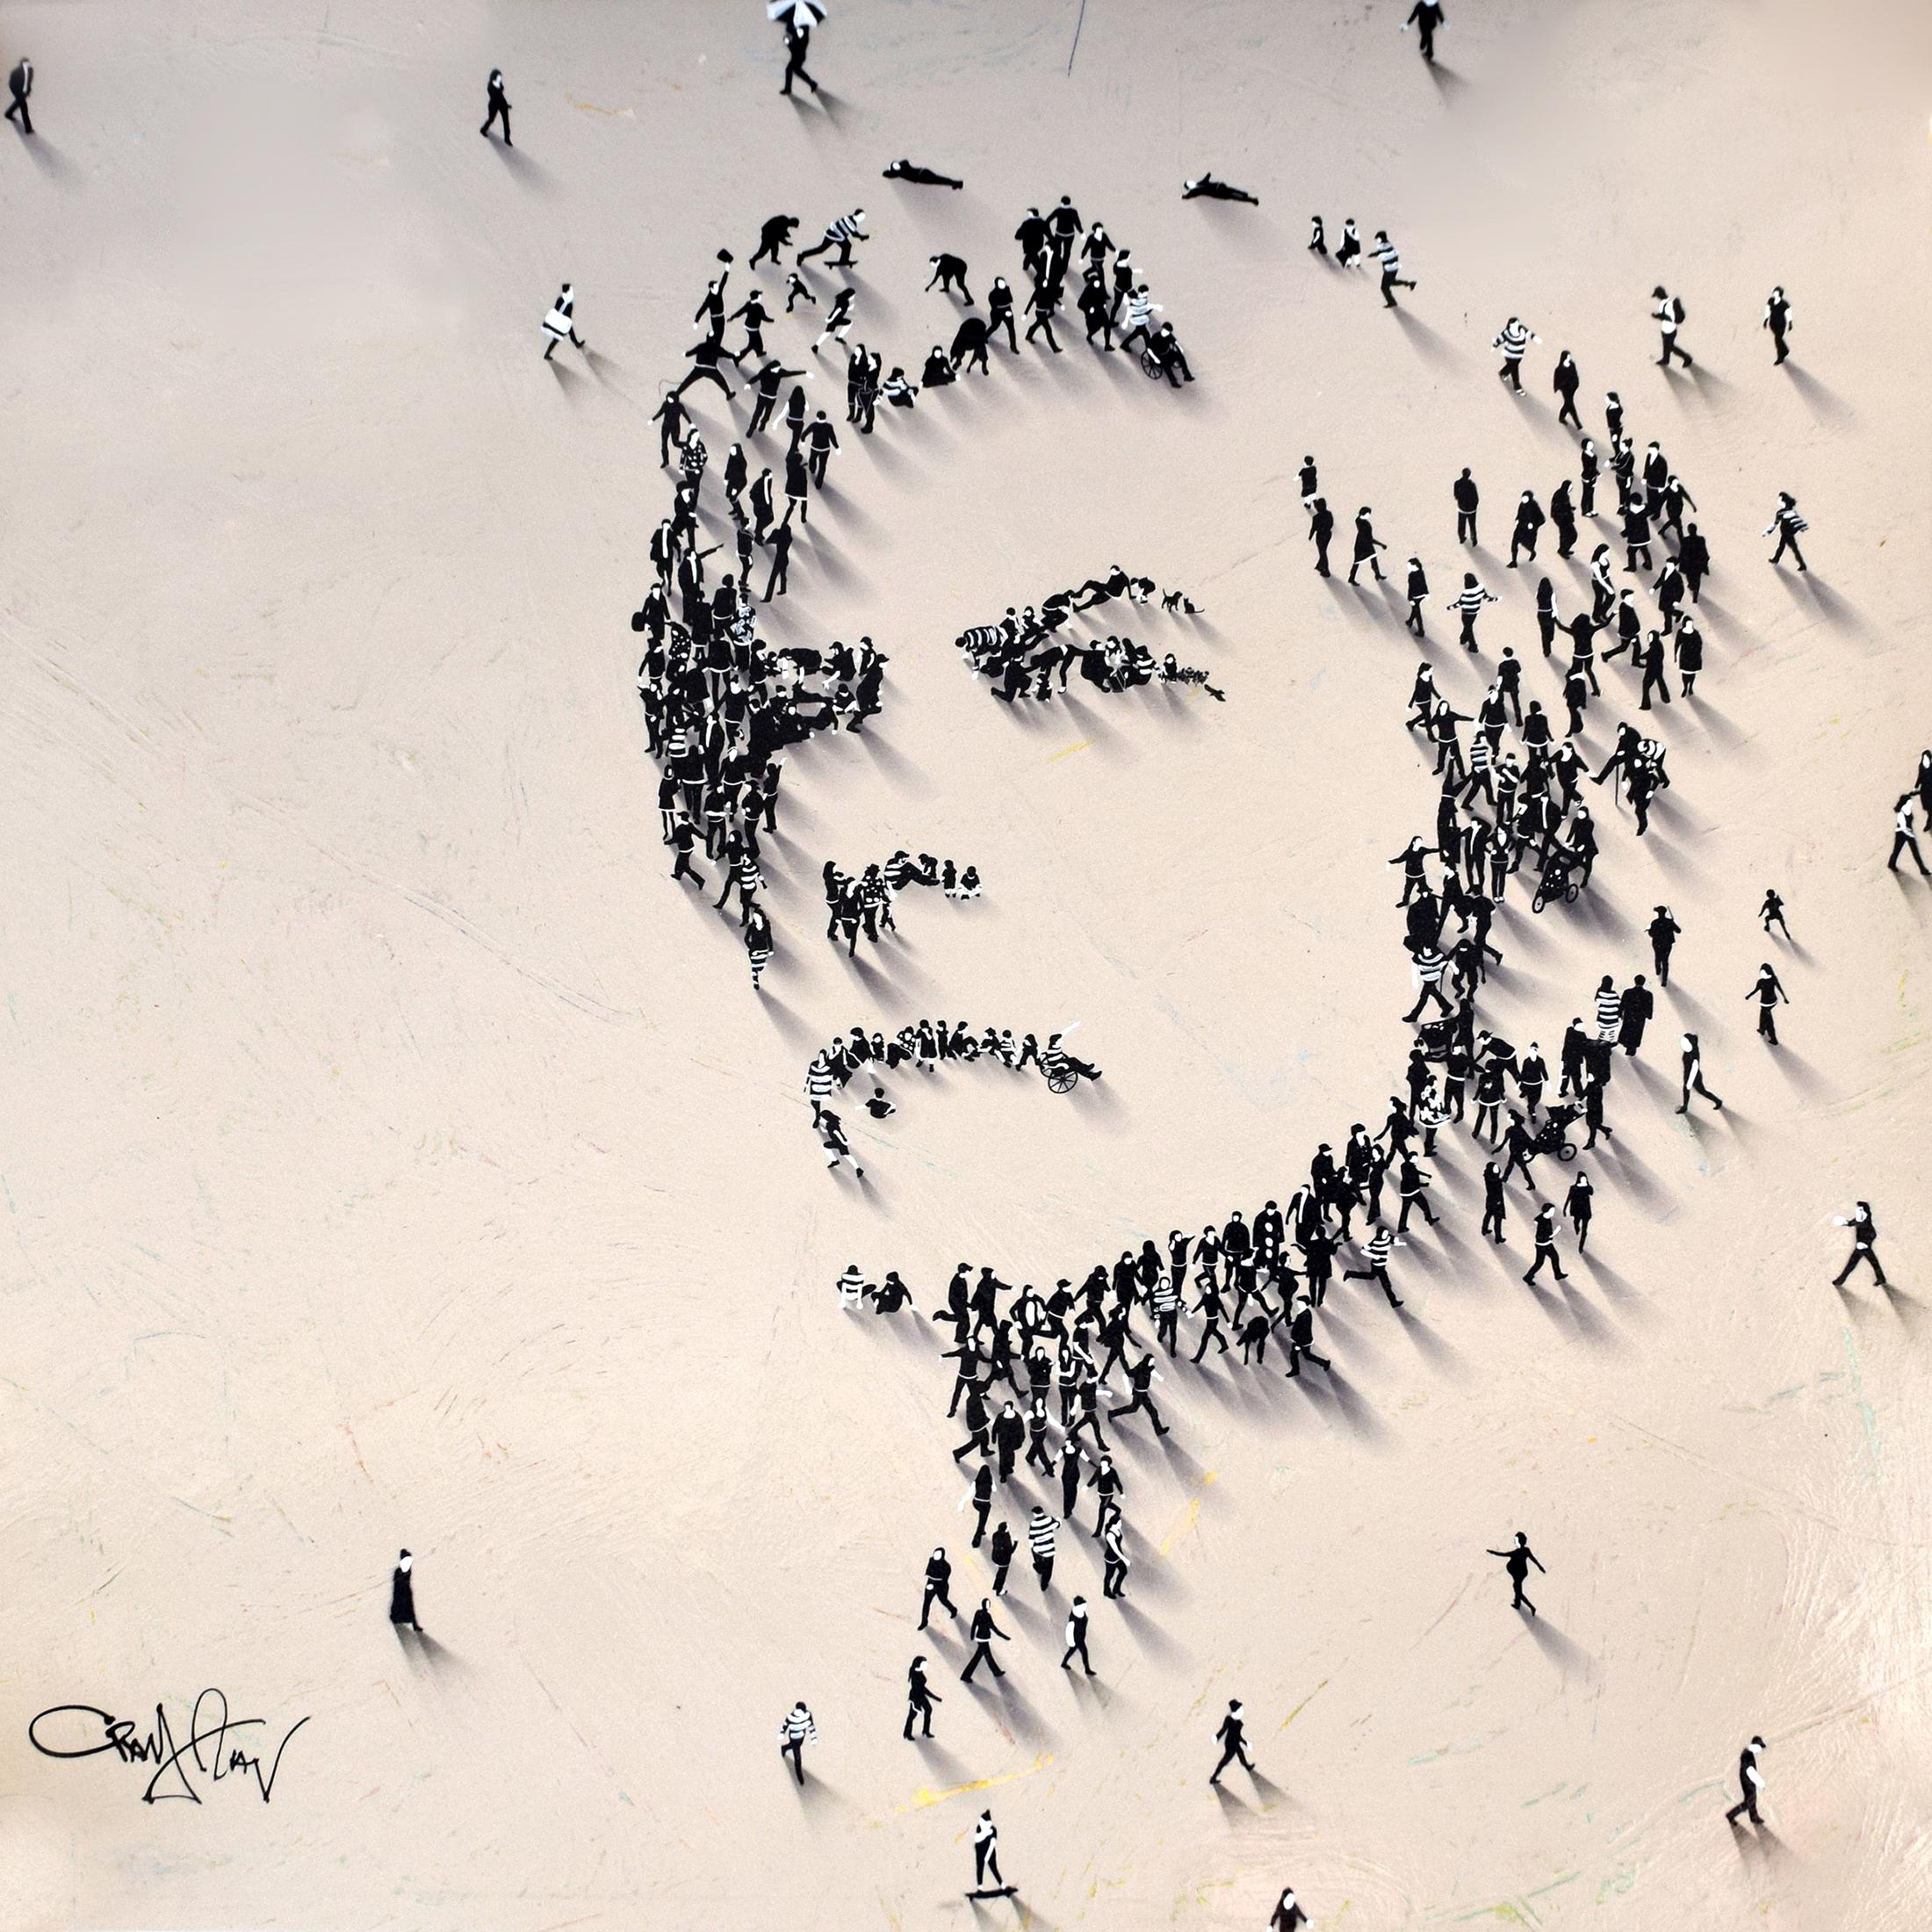 Craig Alan - More than Human , 5055-012-127